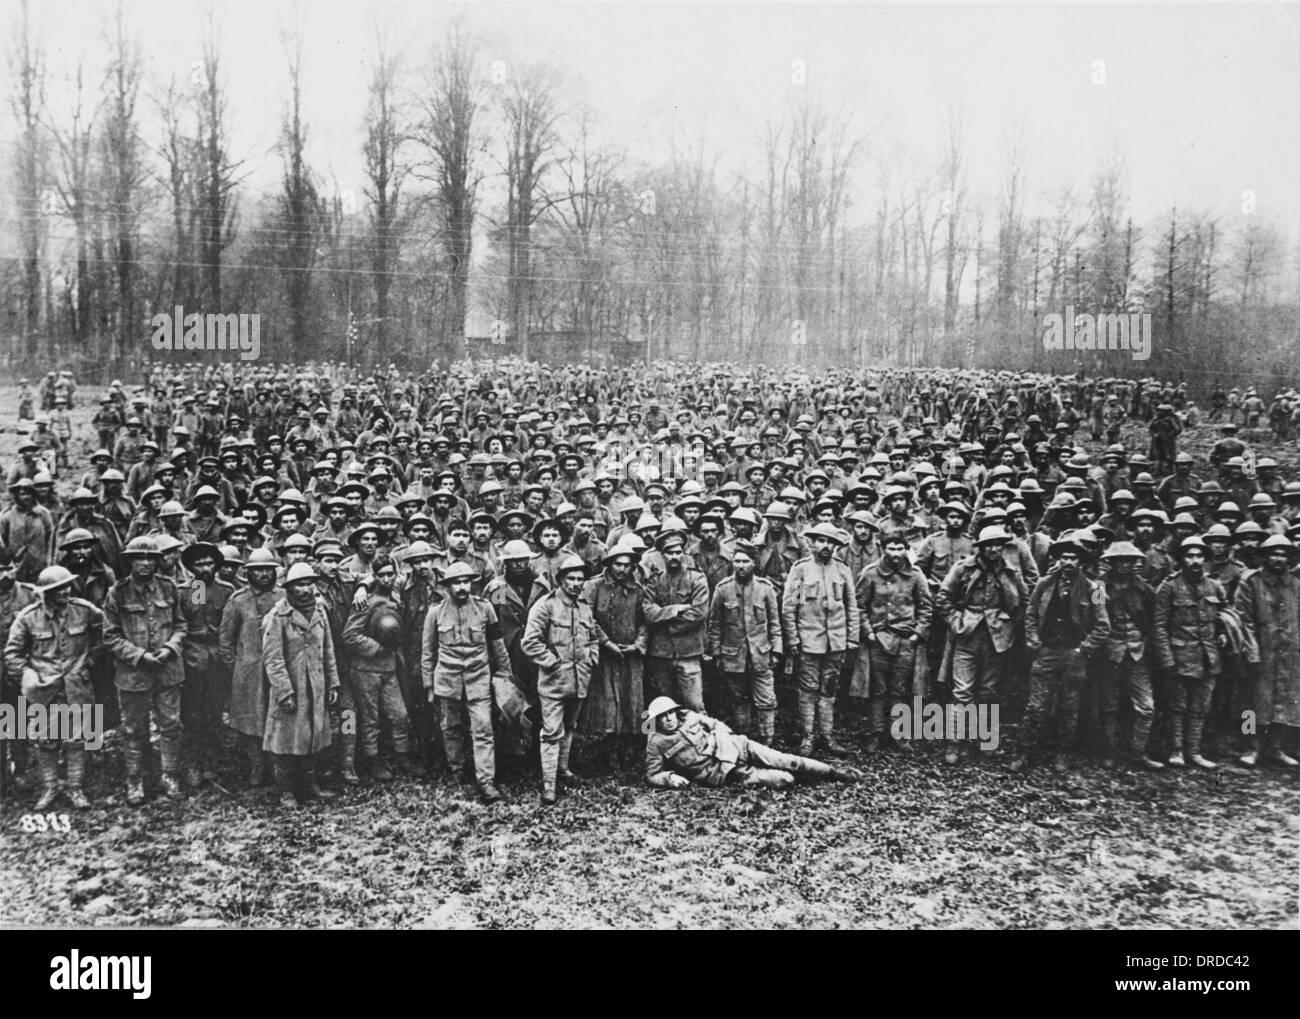 WWI prisoners - Stock Image